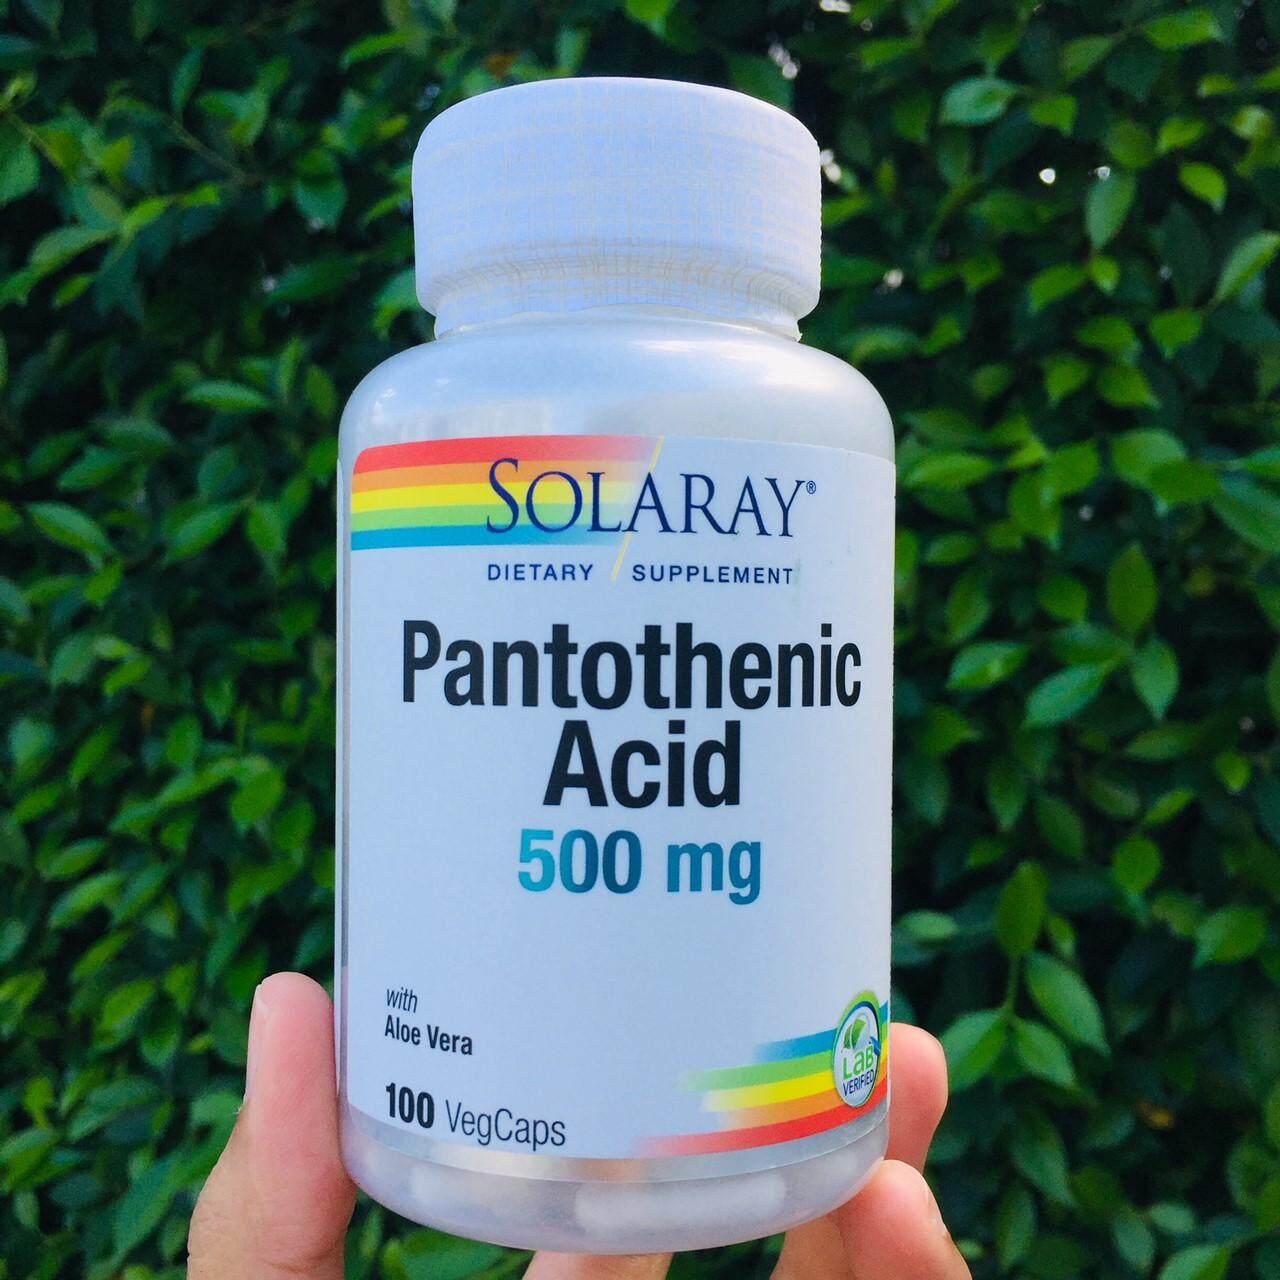 B5 กรดแพนโทเทนิก Pantothenic Acid 500 Mg 100 Vegcaps (solaray®) วิตามินบี 5 บำรุงผิว ลดสิว ลดความเครียด เพิ่มการเผาผลาญ B-5.